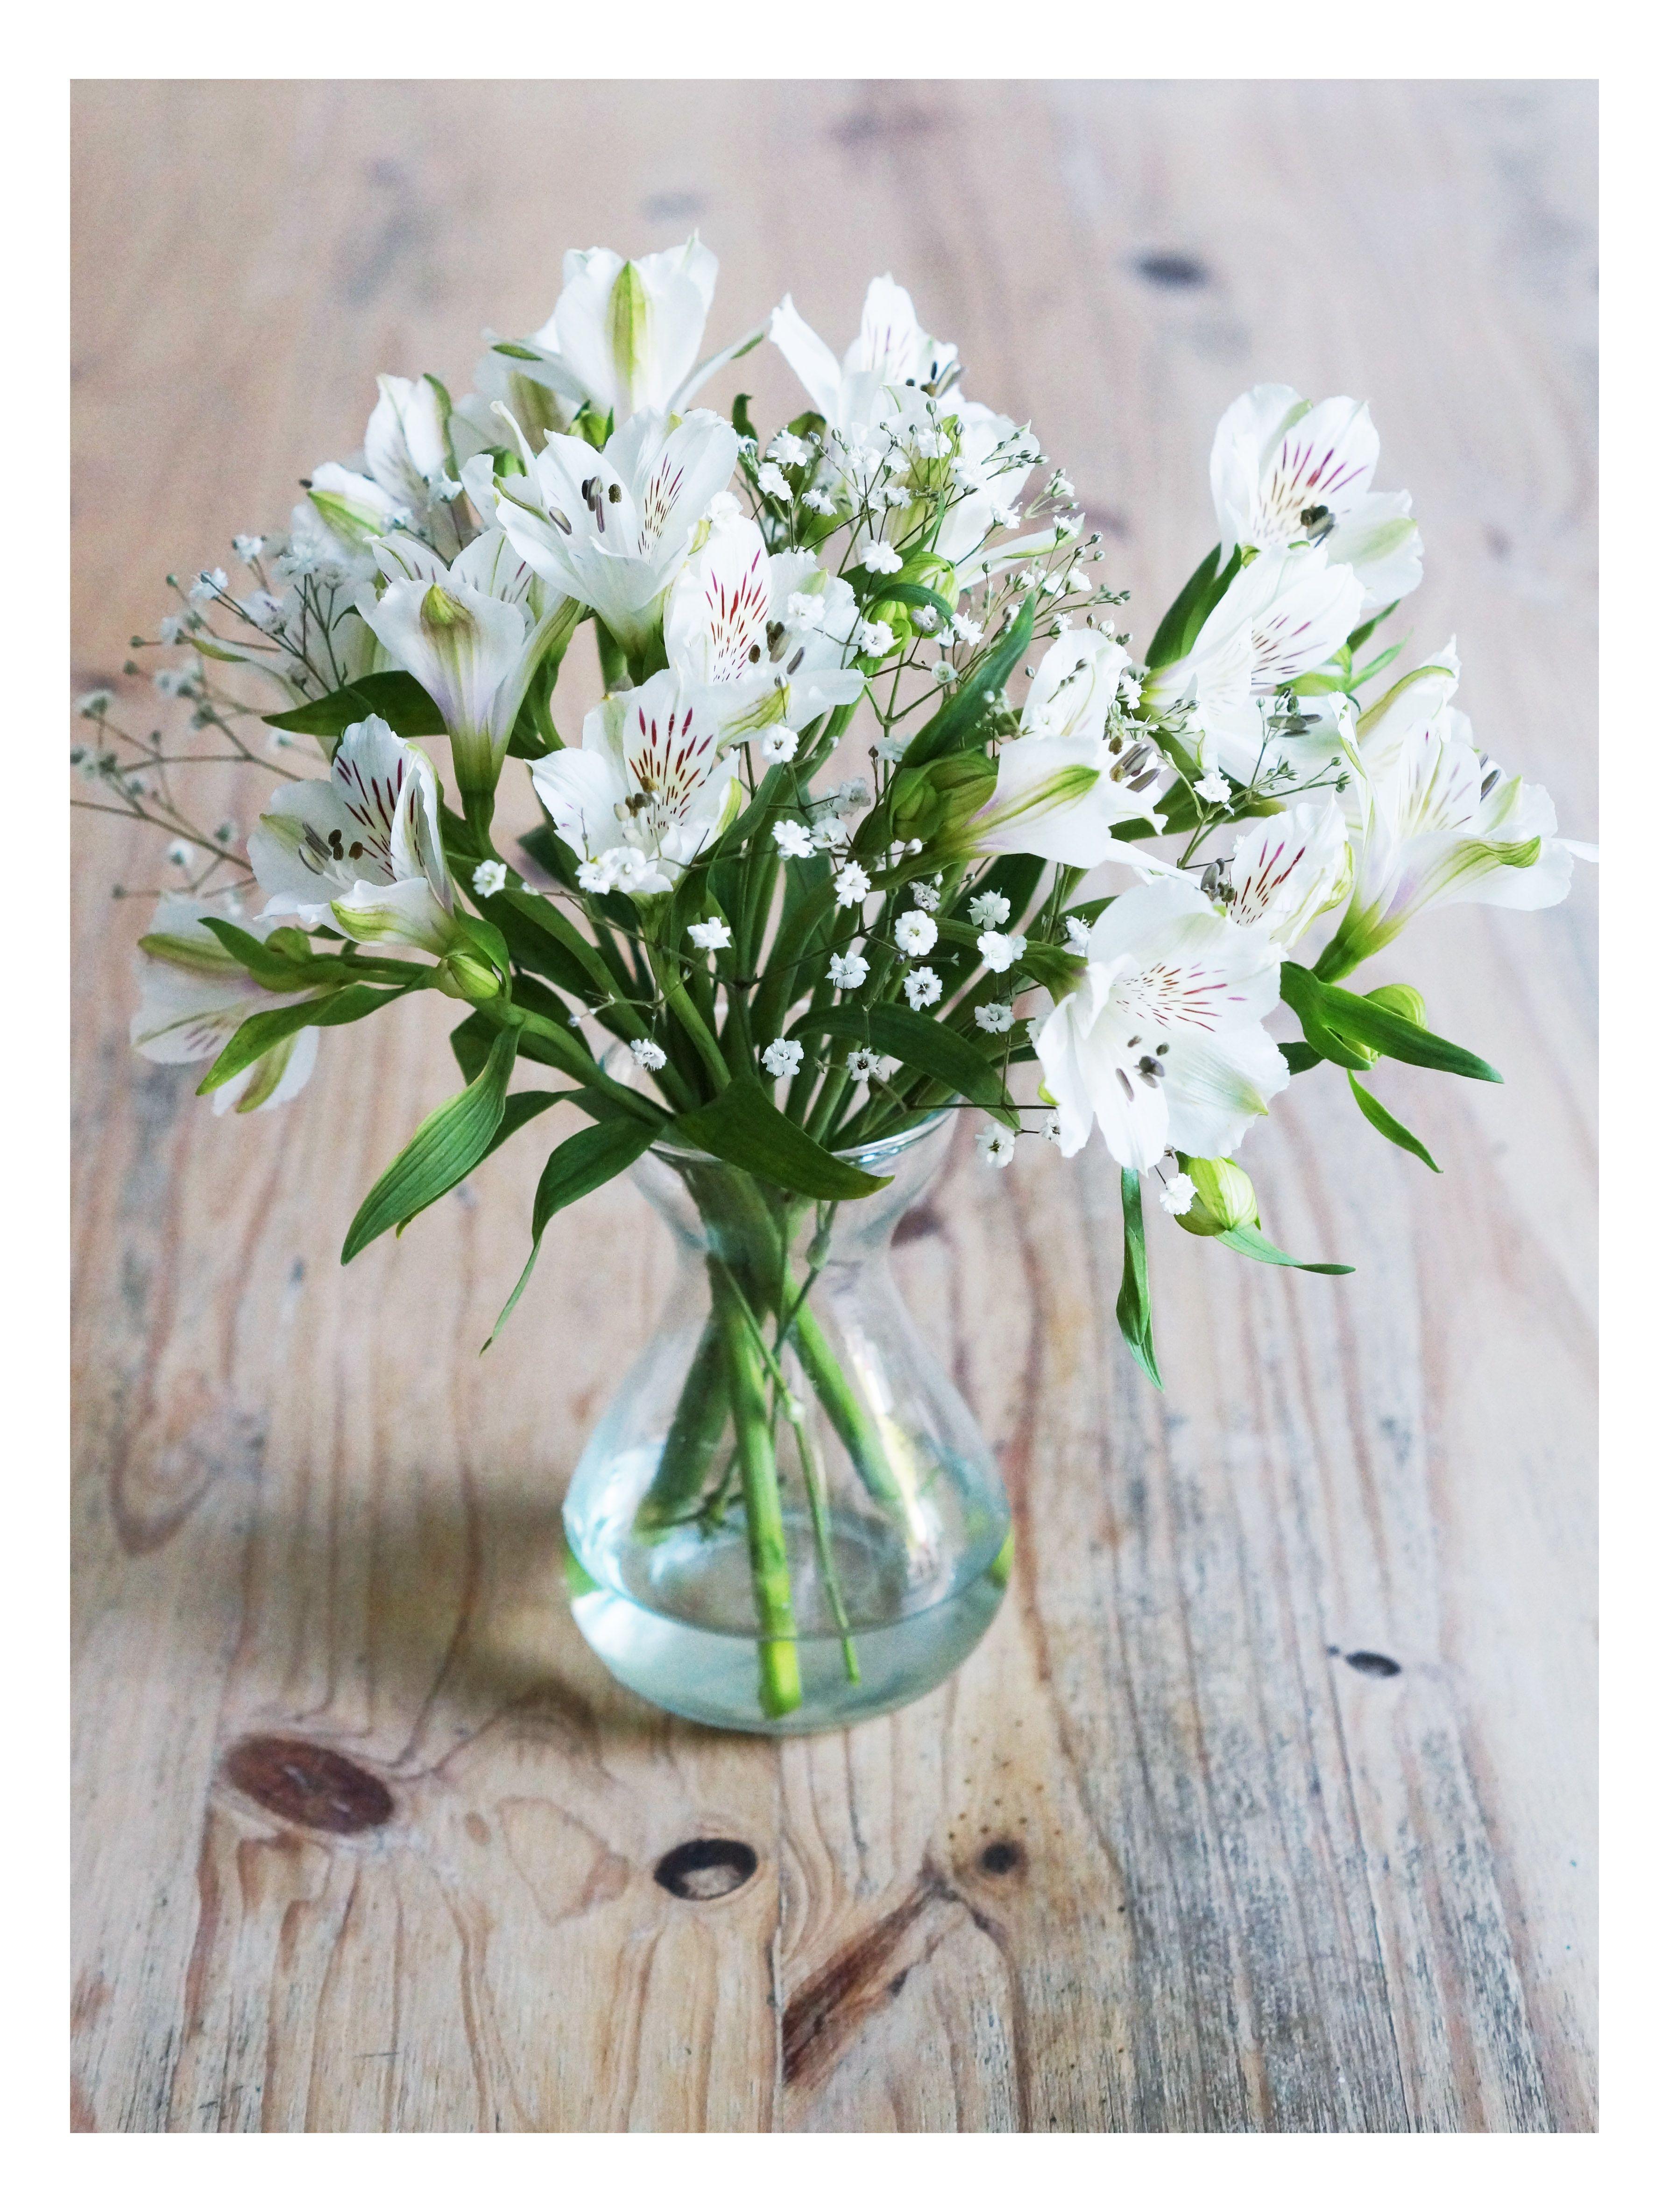 Arreglofloral Flores Gypsophylla Centerpiece Weddingdeco Boda Deco Dec Alstroemeria Bouquet Wedding Alstroemeria Wedding Centerpieces Lily Centerpieces